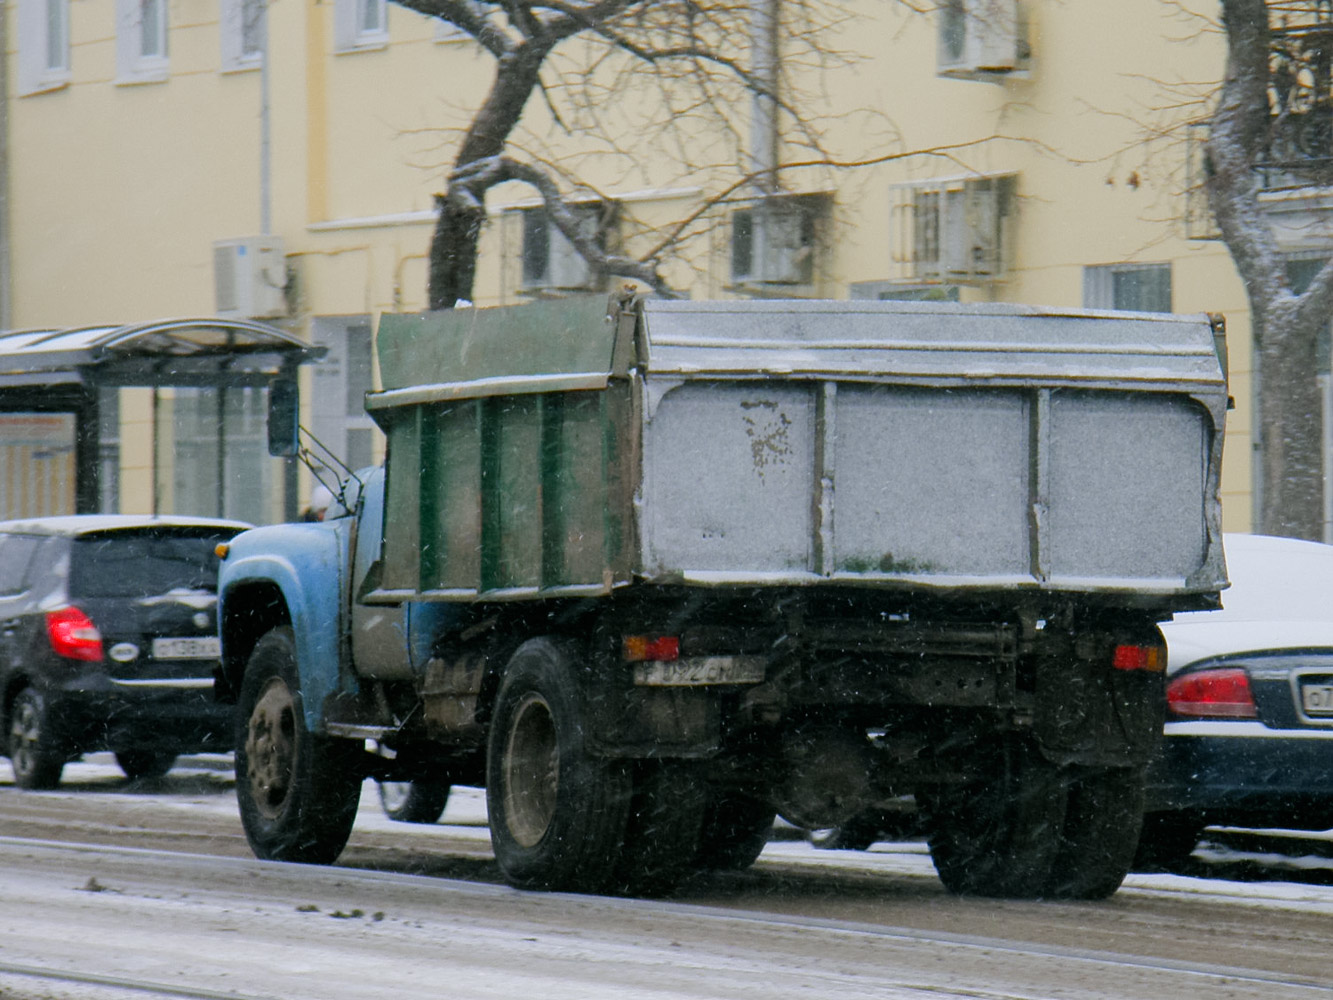 ЗиЛ-ММЗ-4502 #Р 092 СК 63. Самара, улица Фрунзе